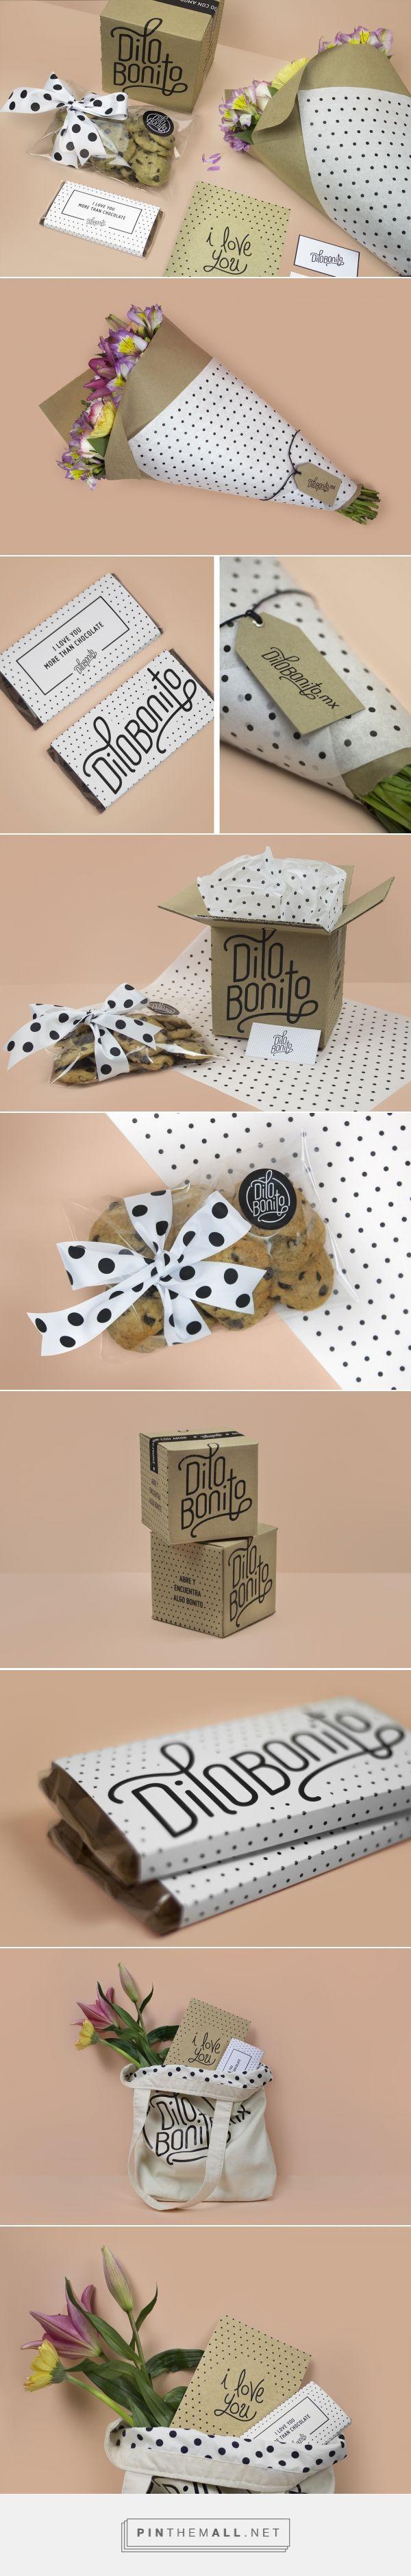 "Dilo Bonito // Dilo Bonito (""Say it pretty"") is an online gift delivery store"